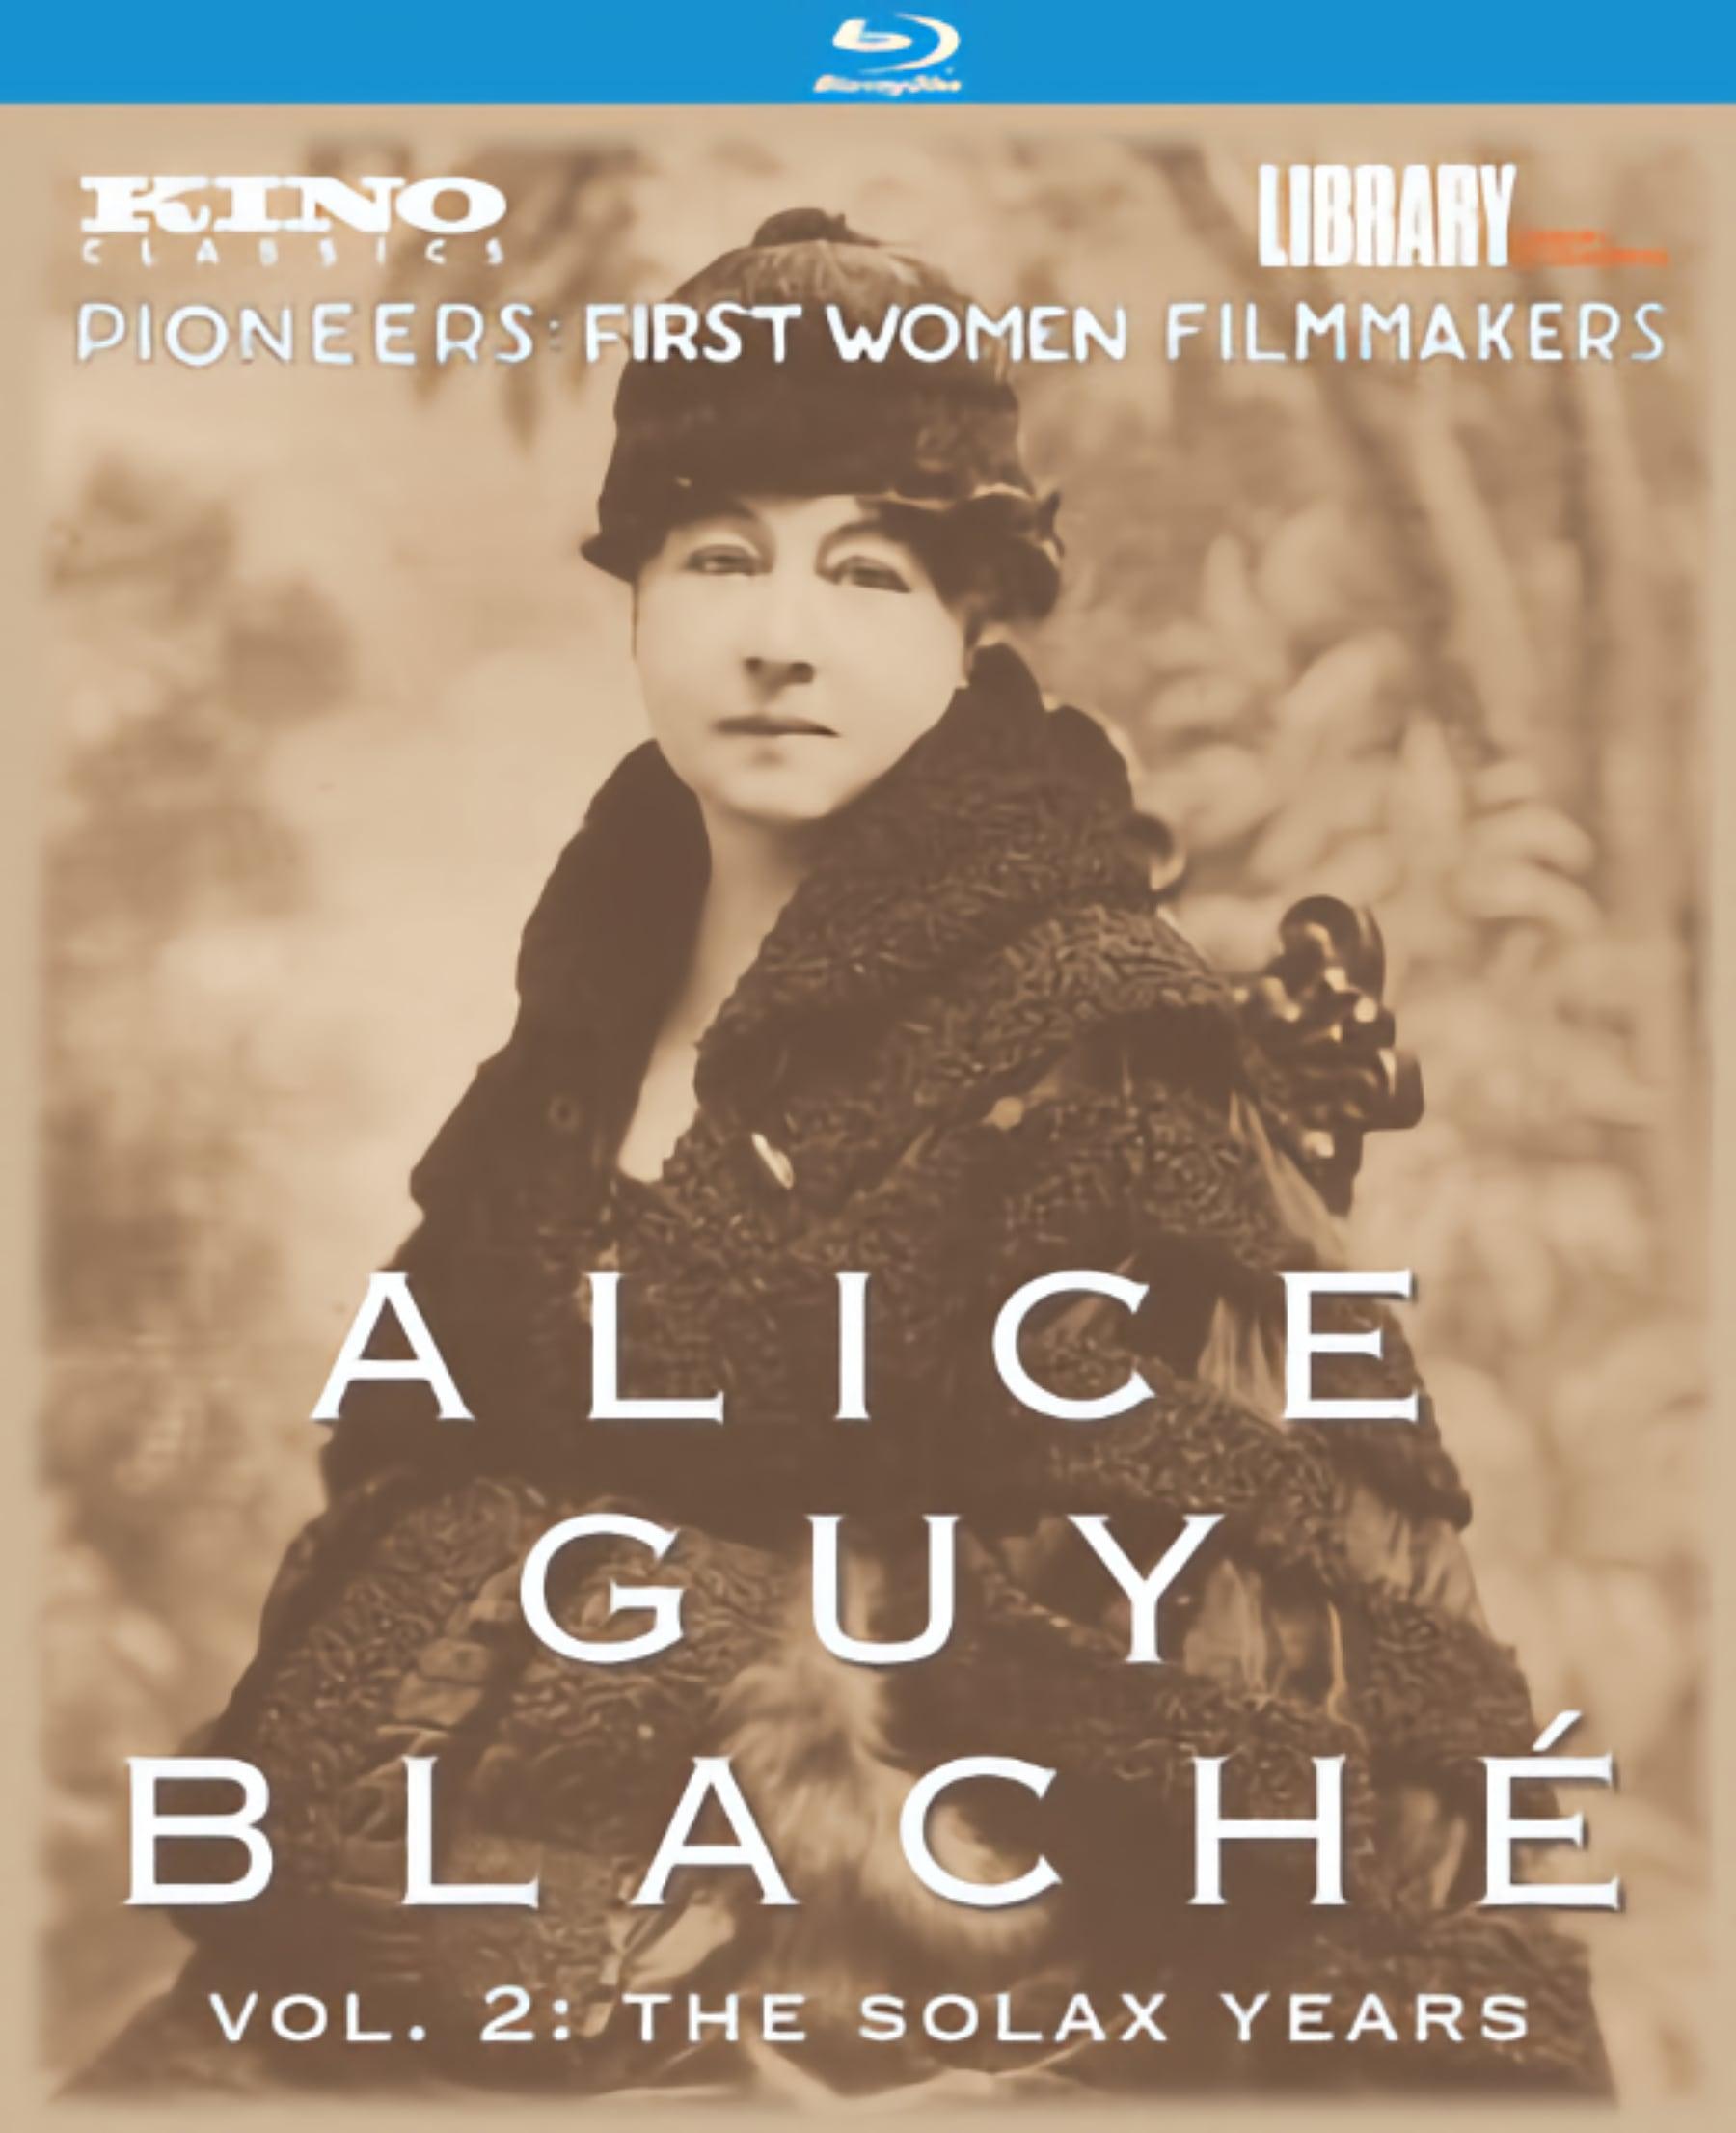 Alice Guy Blachet, Vol. 2: The Solax Years